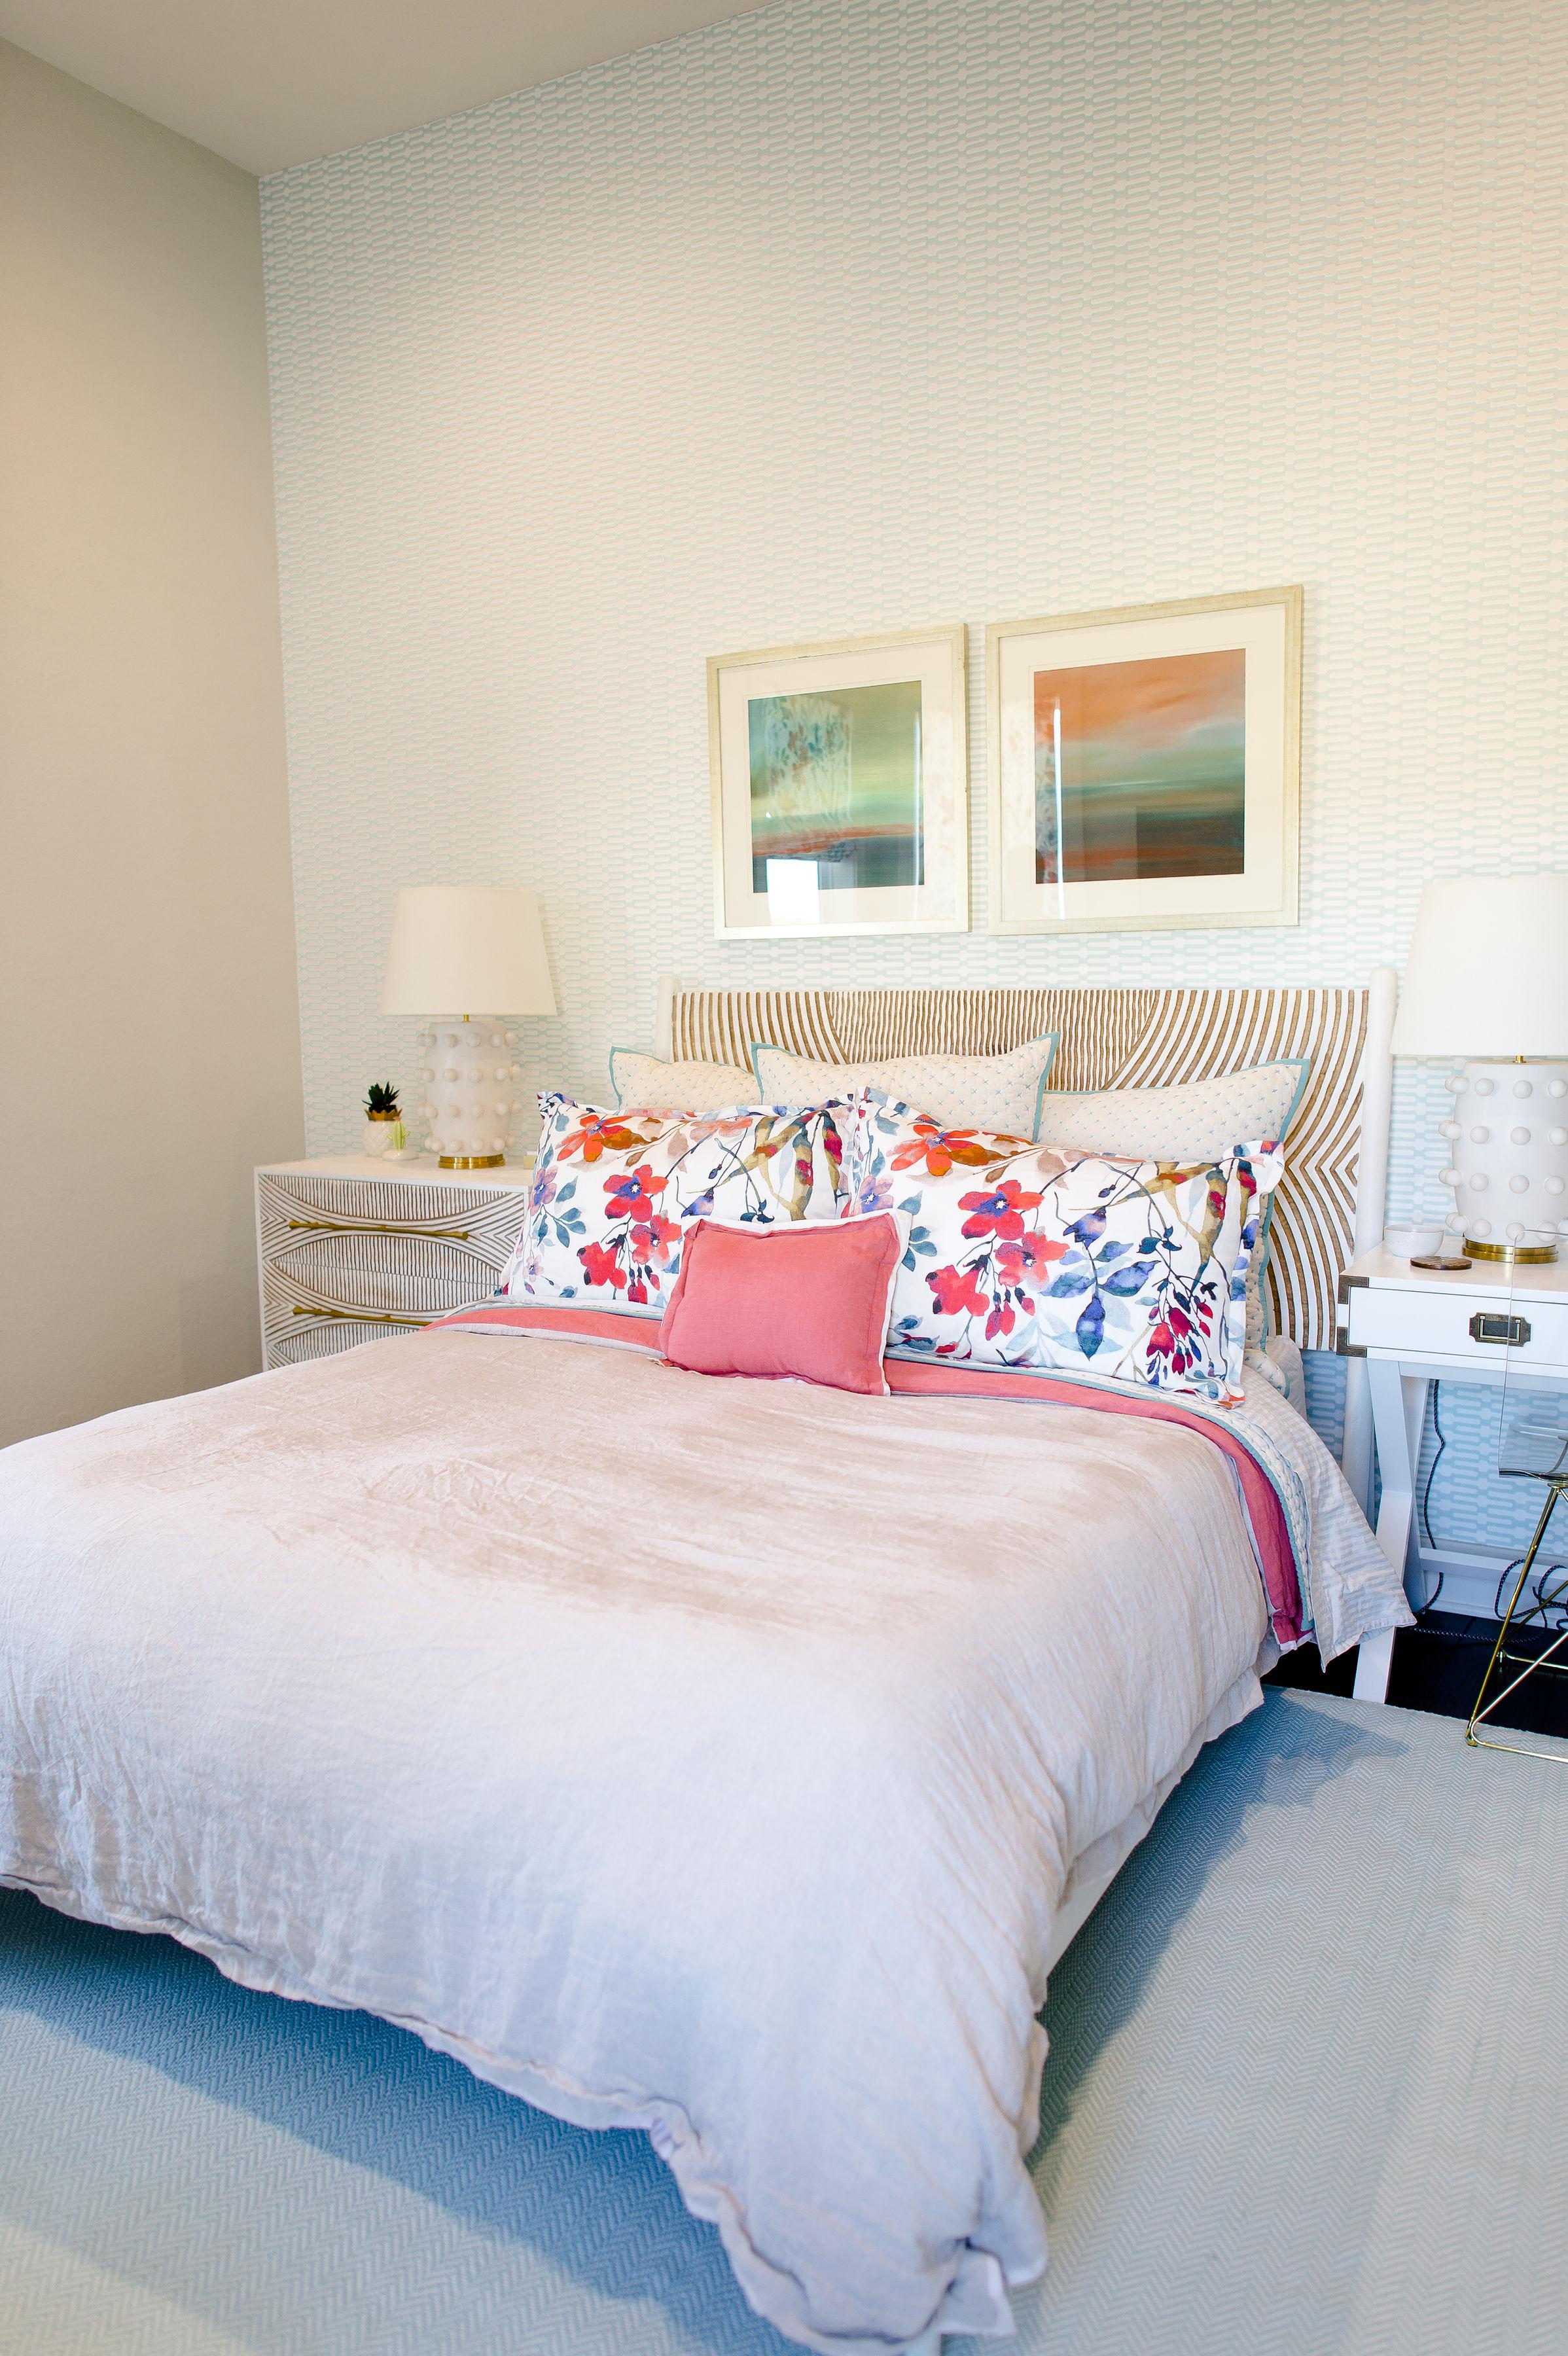 hill-country-transitional-clark-design-studio-wichita-falls-tx-girls-bedroom.jpg